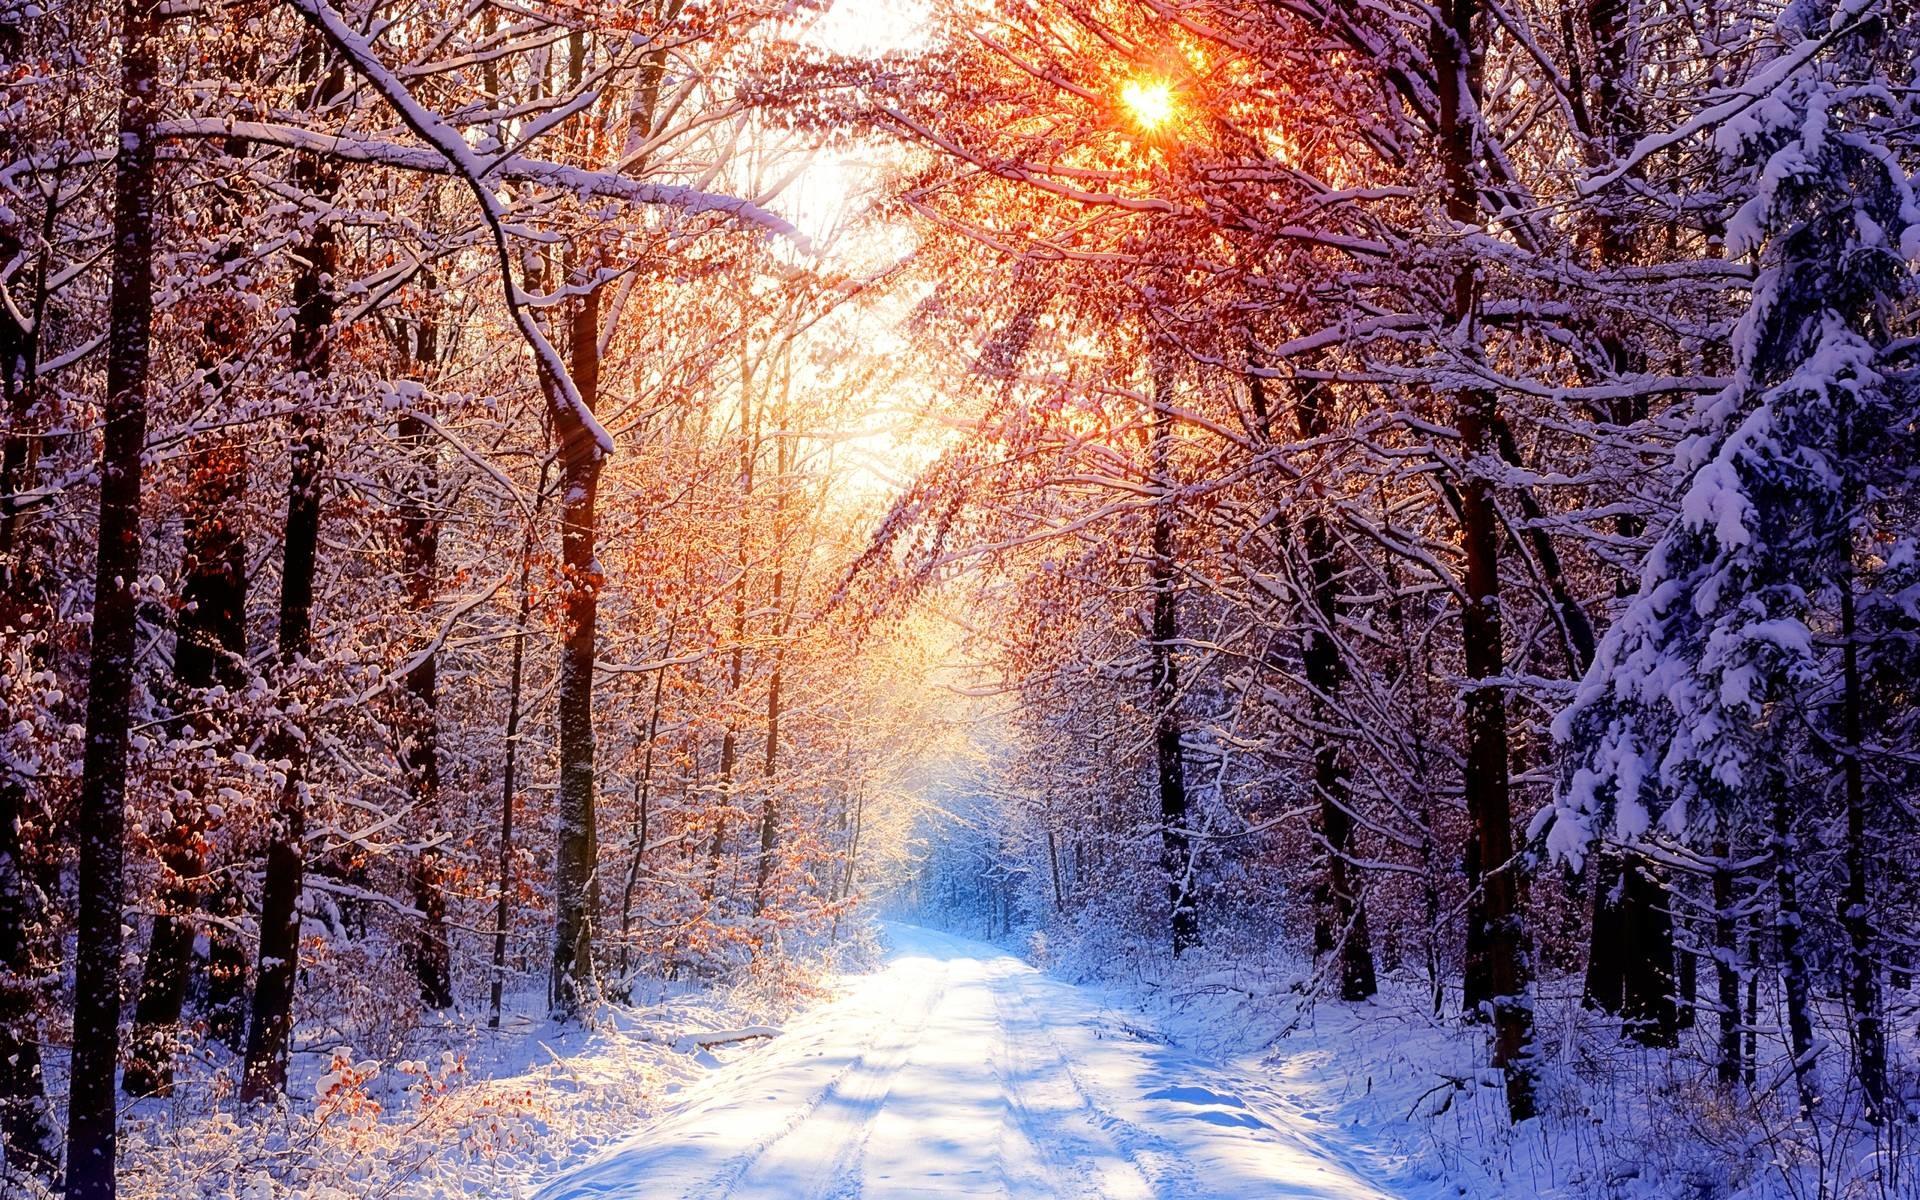 Hd Wallpapers 1080P Snow wallpaper – 444634